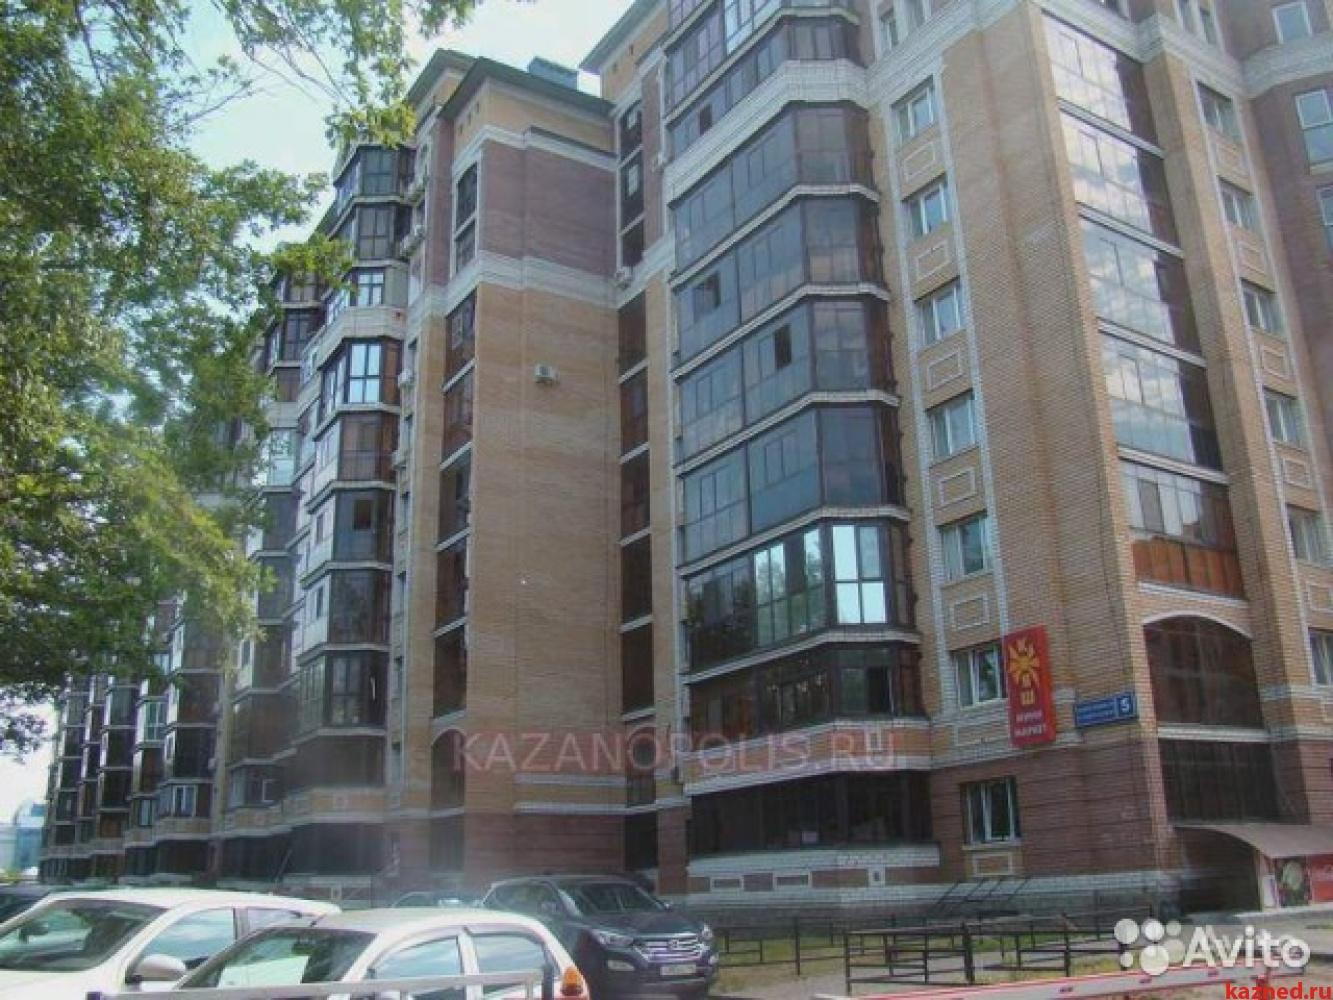 Продажа 3-к квартиры Мидхата Булатова, д.5, 123 м2  (миниатюра №1)